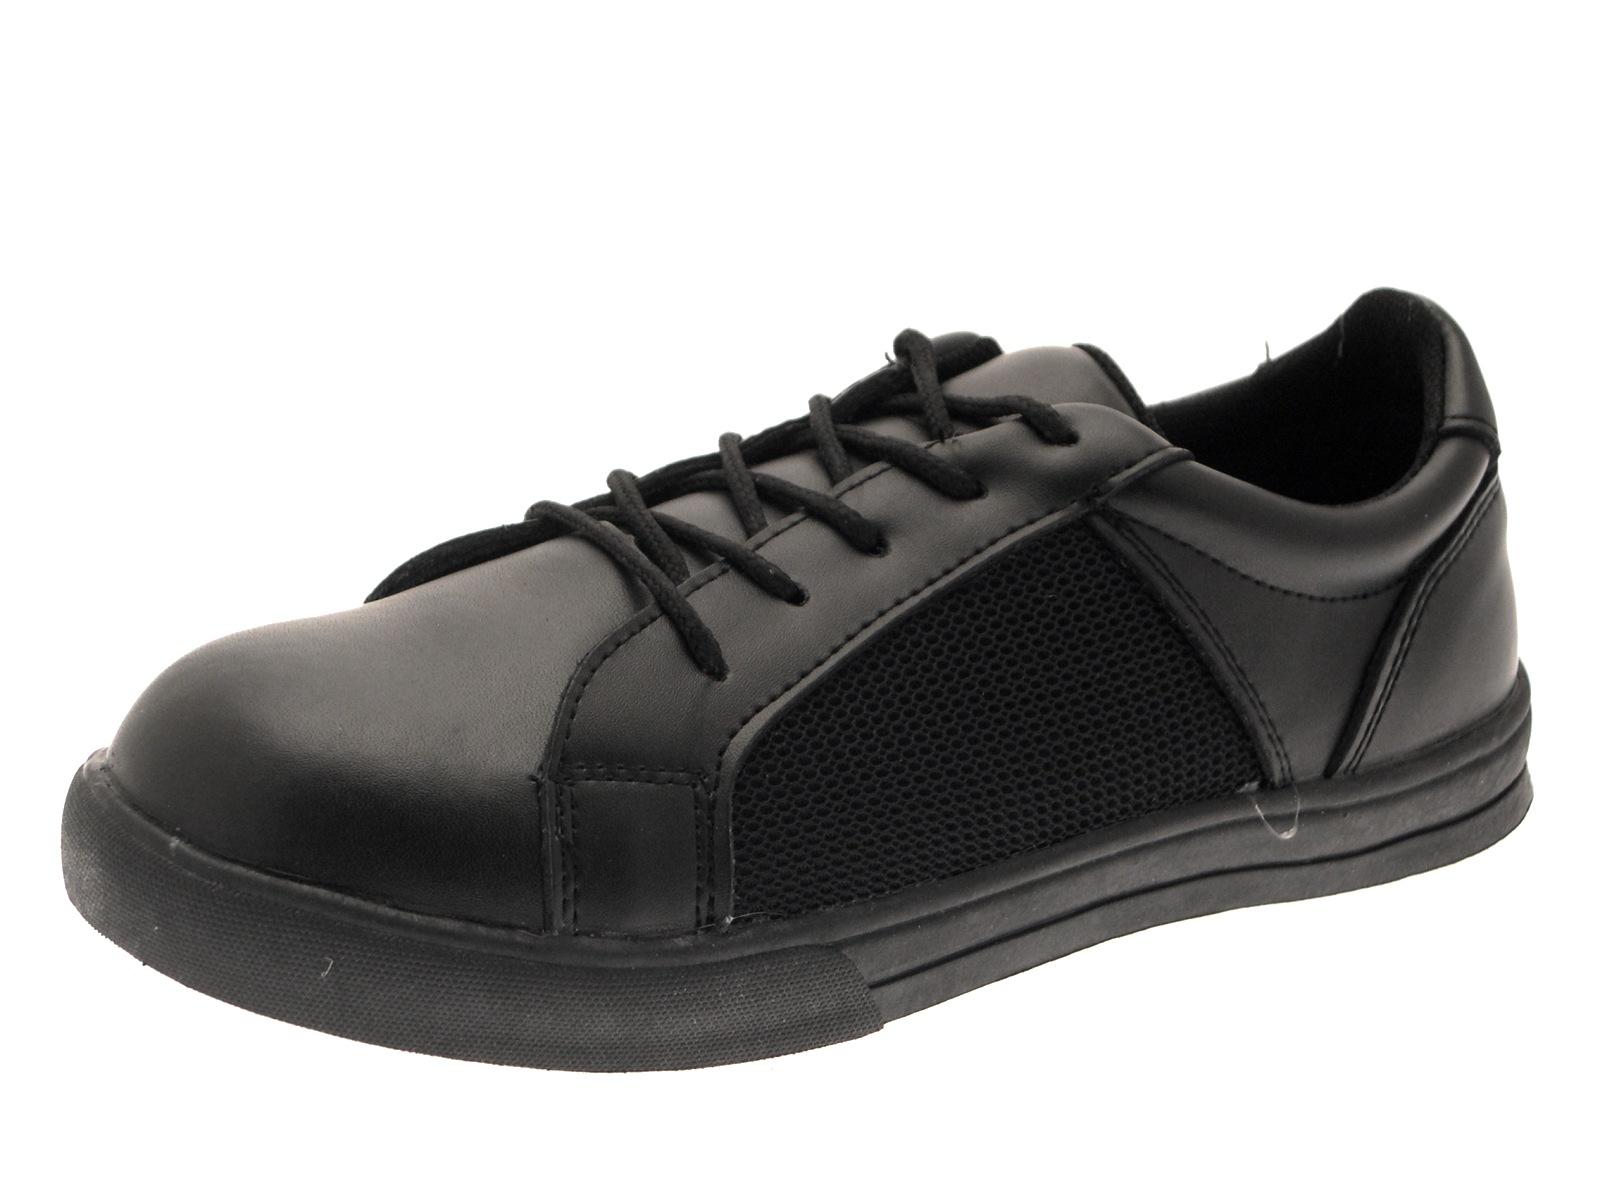 Infant School Shoes Uk